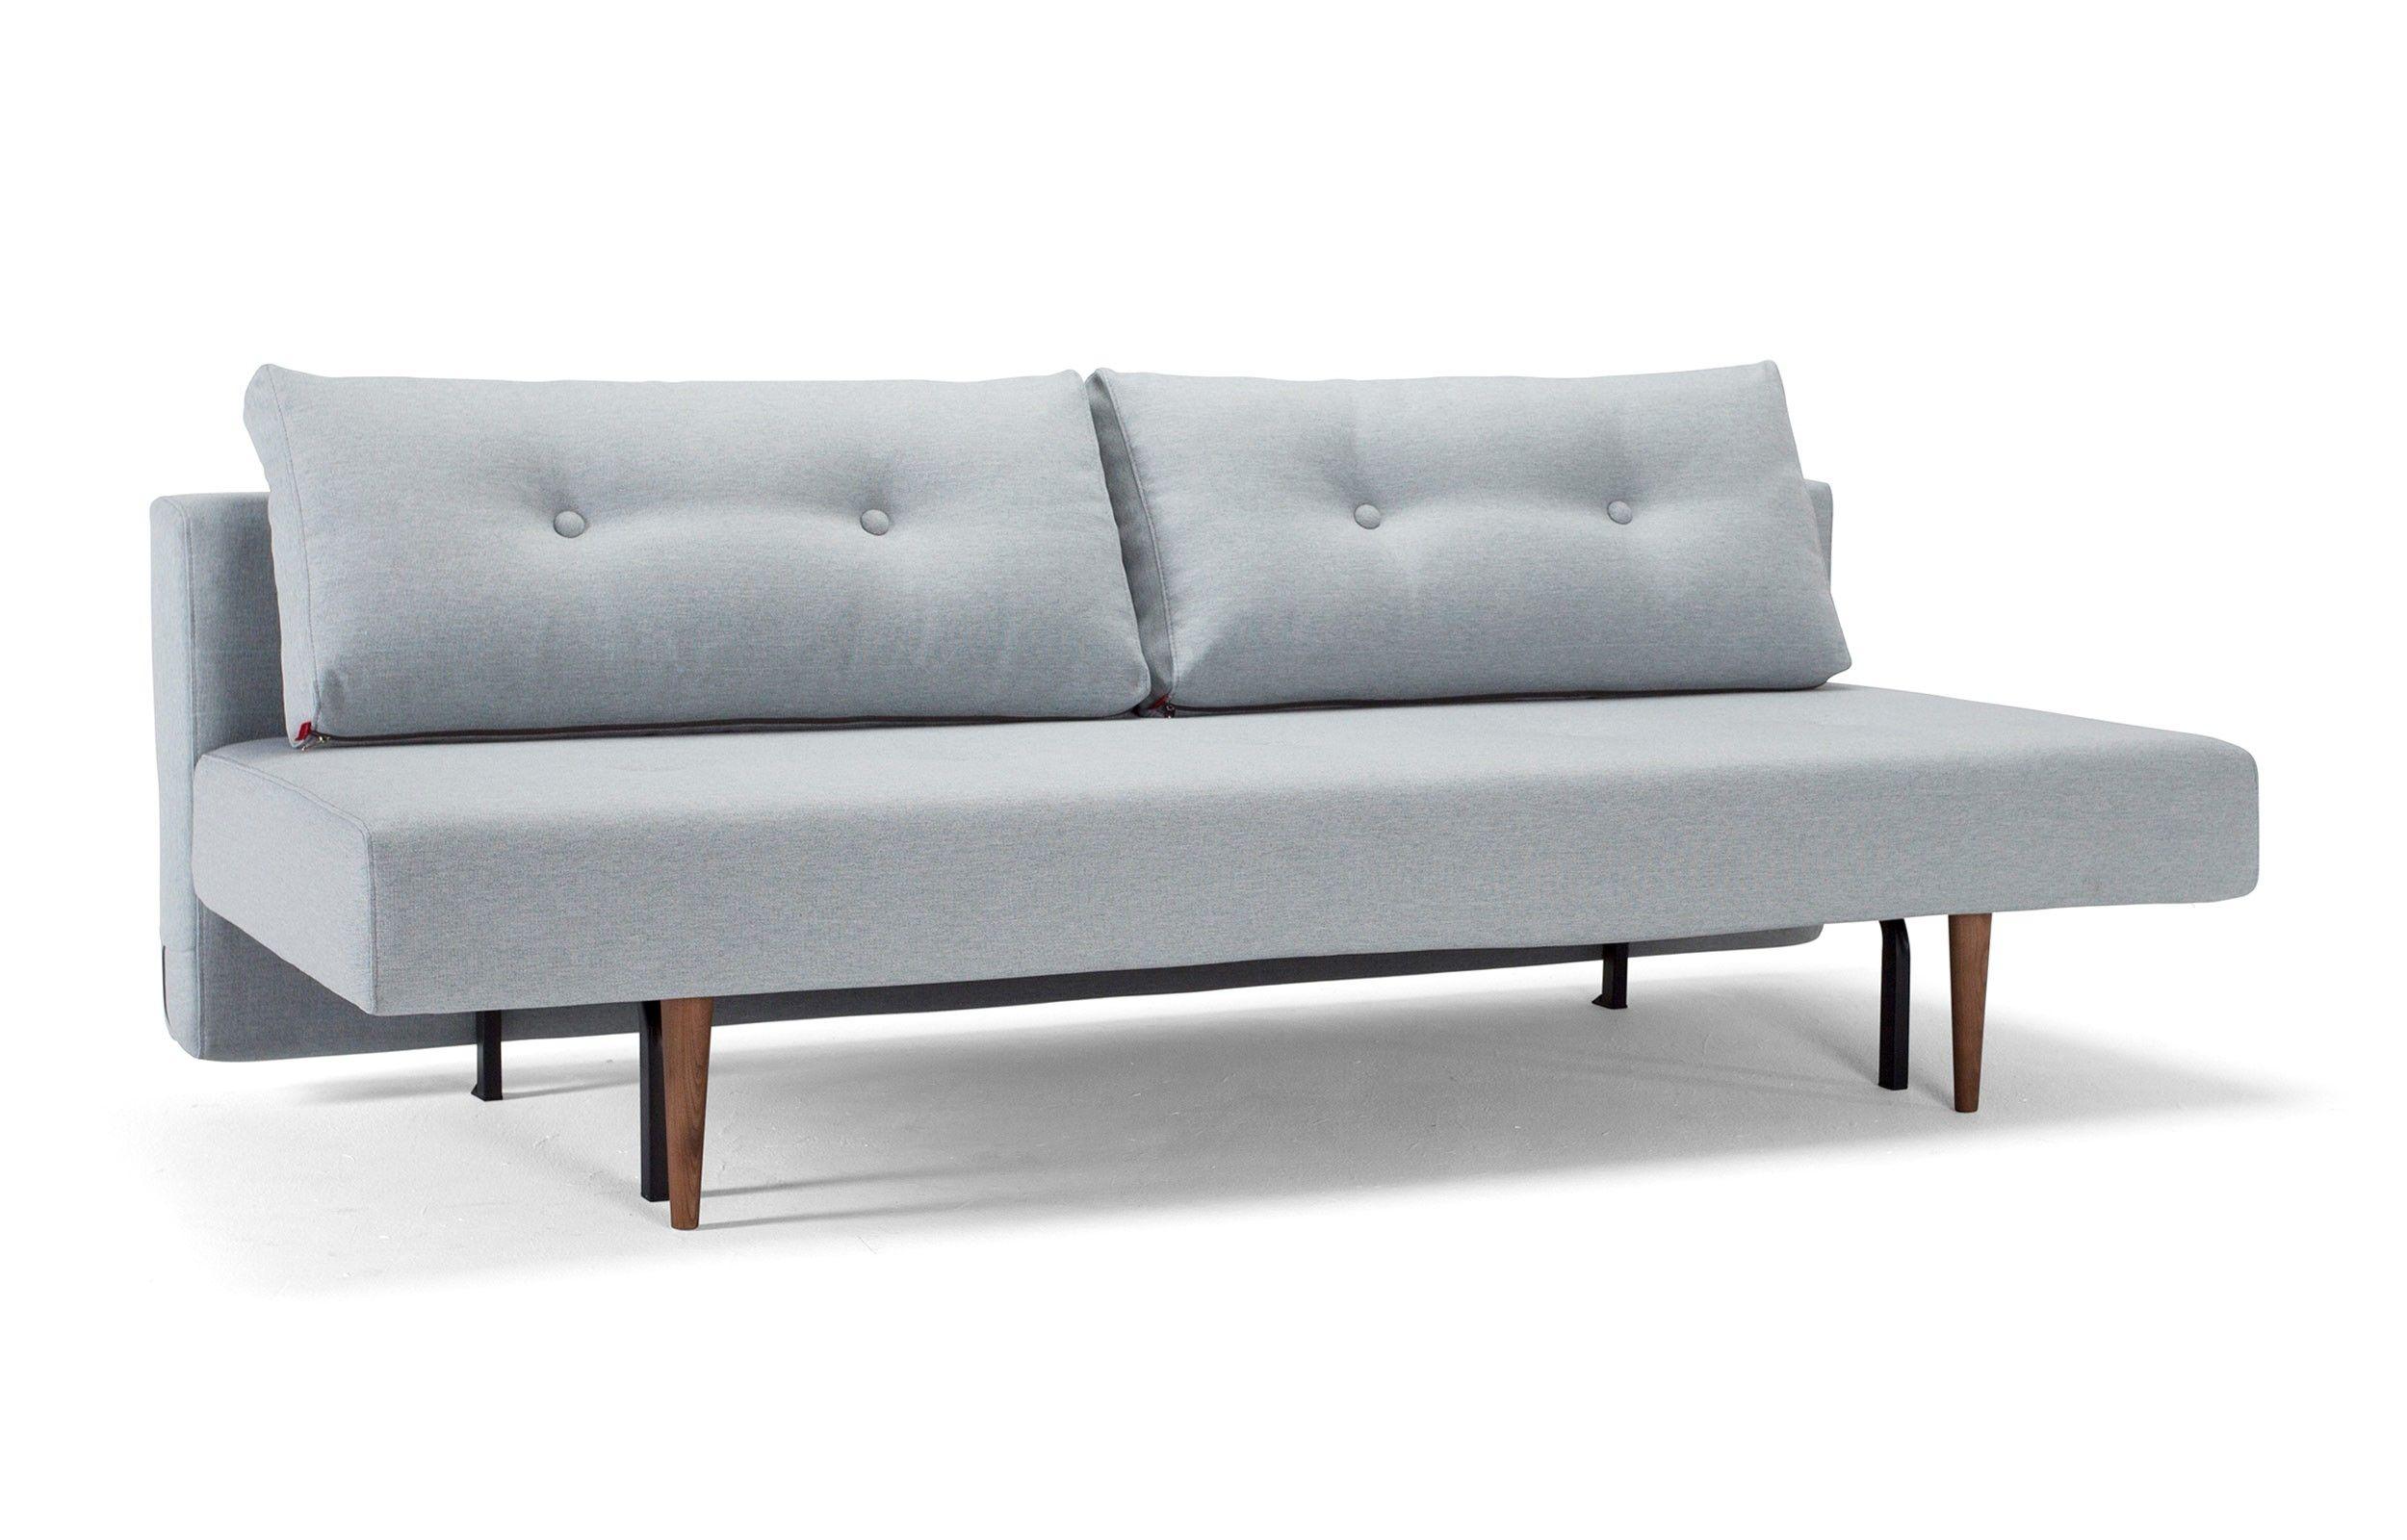 Recast Sofa Bed In 2019 Home Sofa Sofa Bed Elegant Sofa